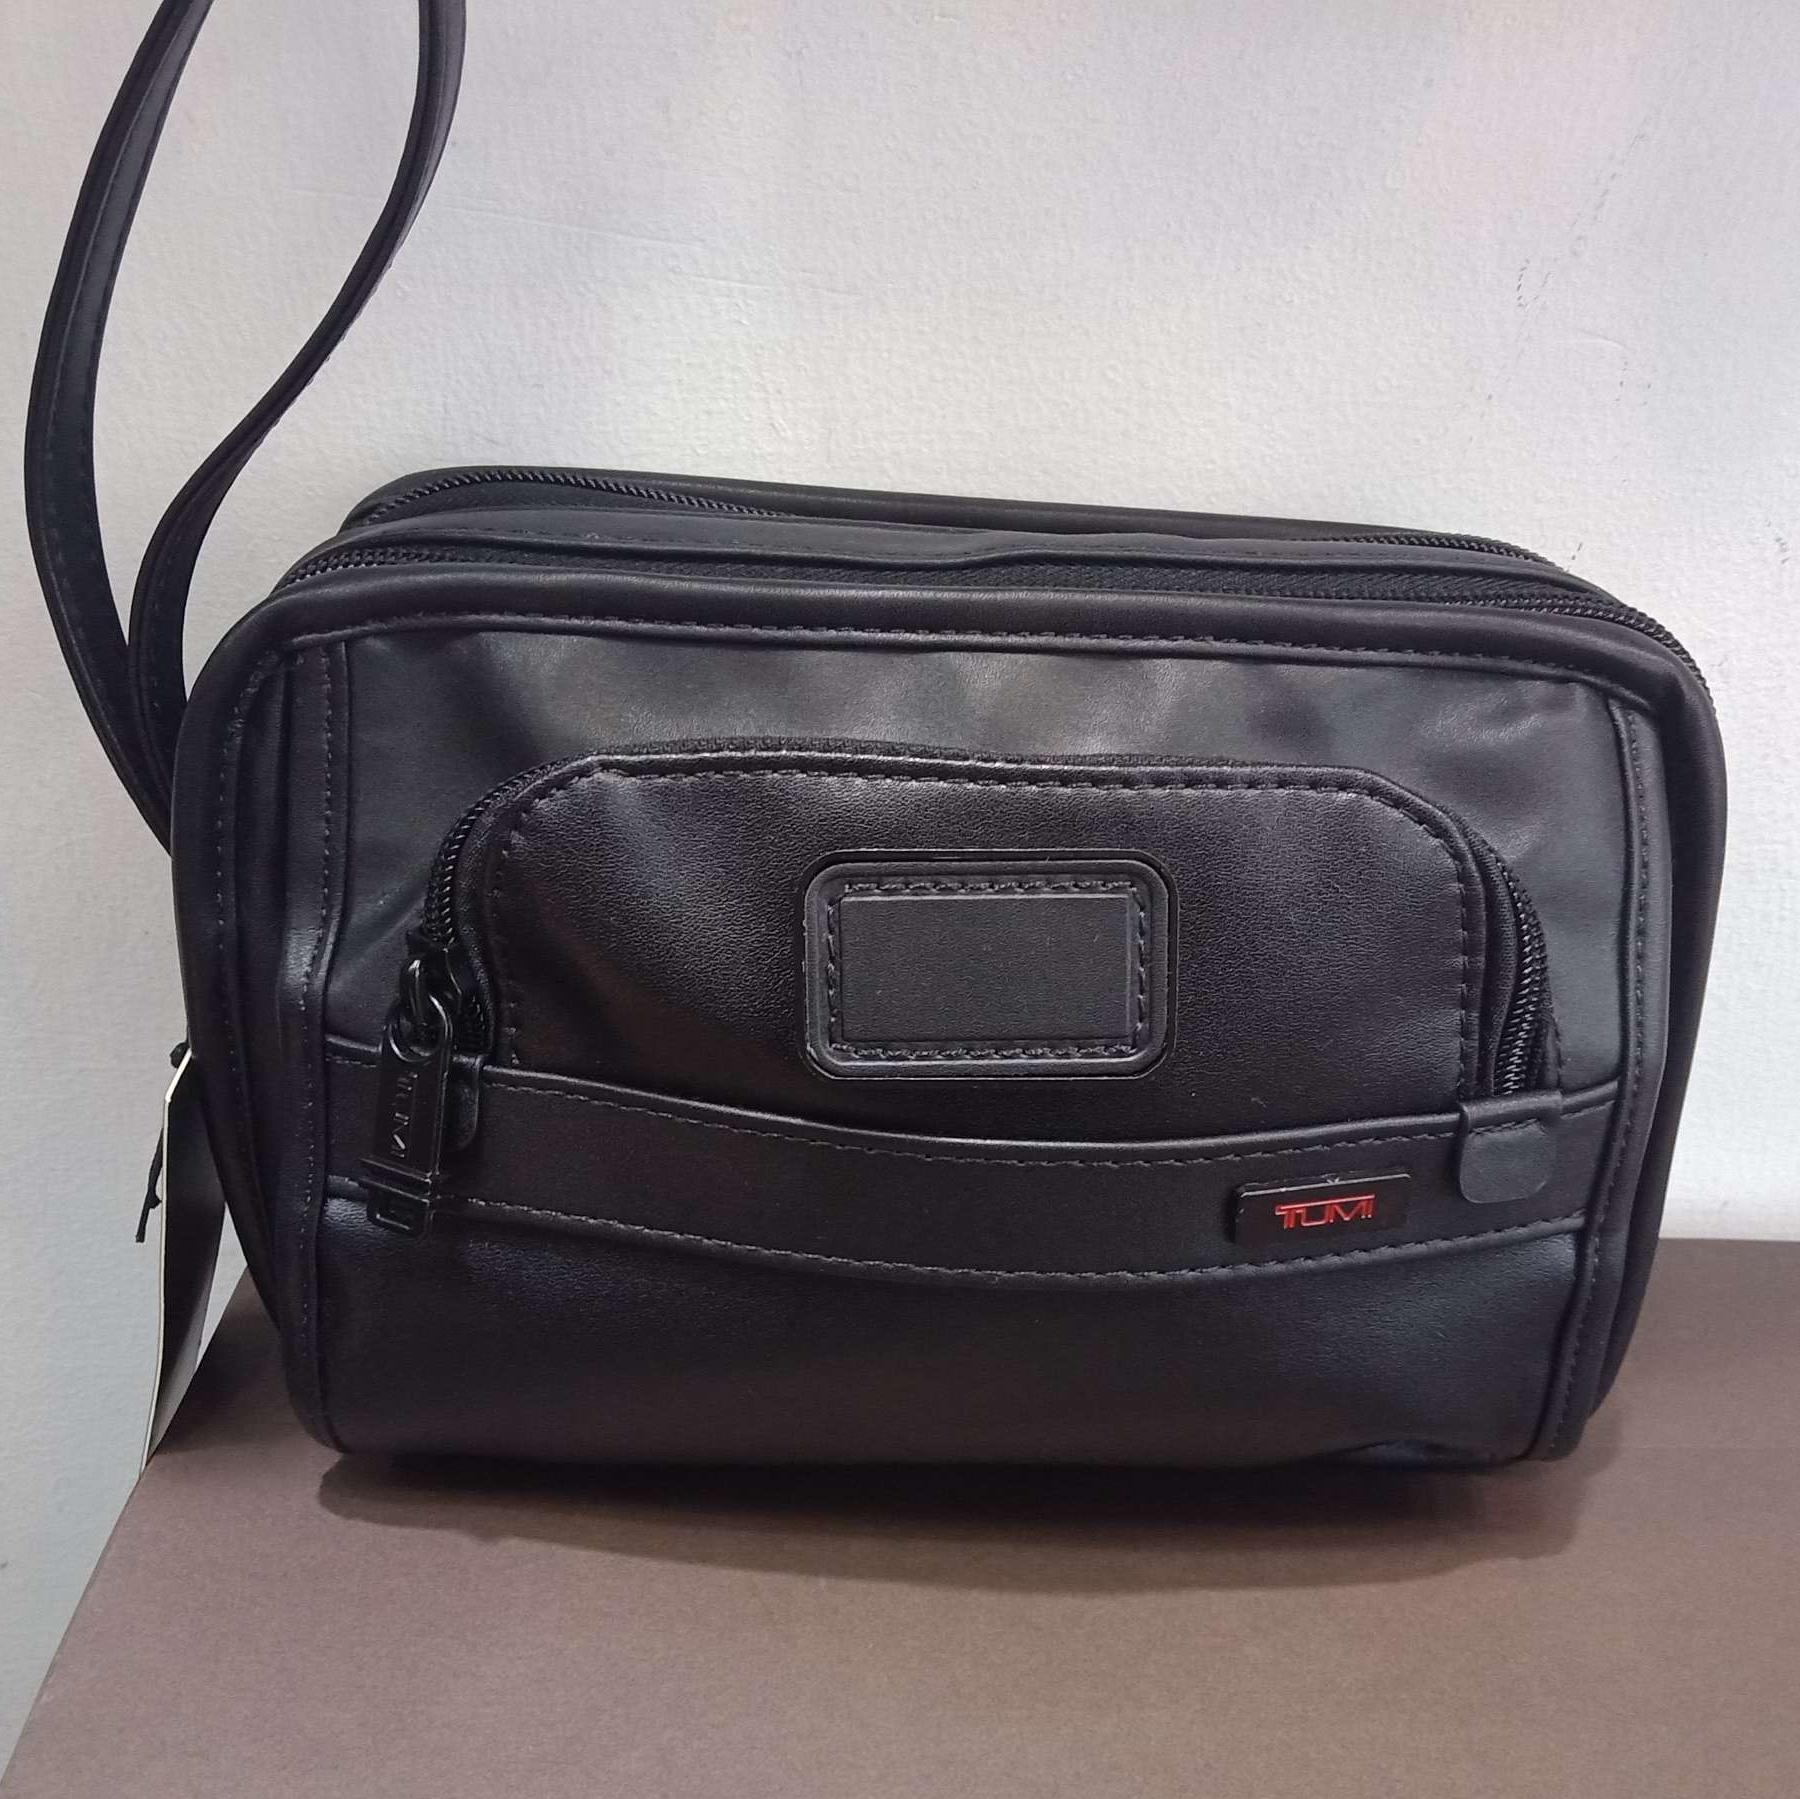 Dompet tas tangan handbag tumi full kulit kualitas mirror